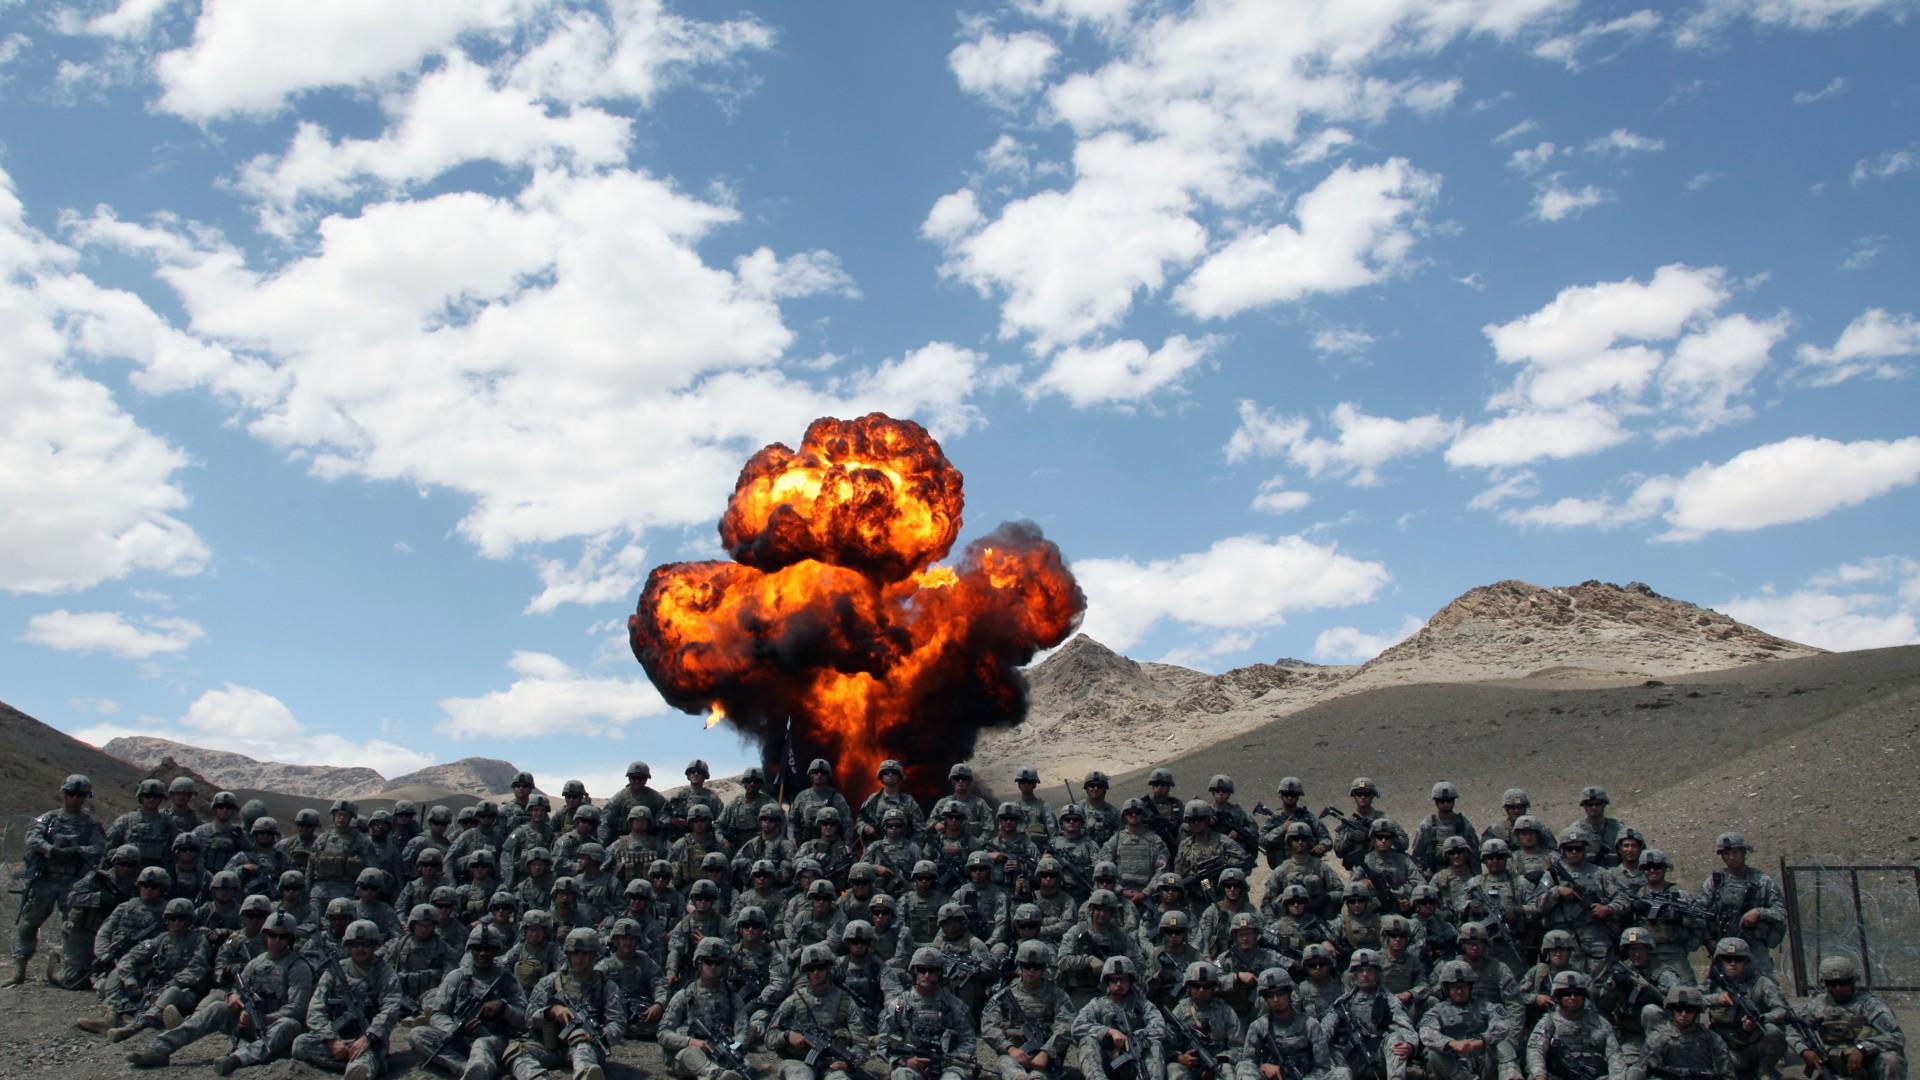 солдаты, взрыв, горы